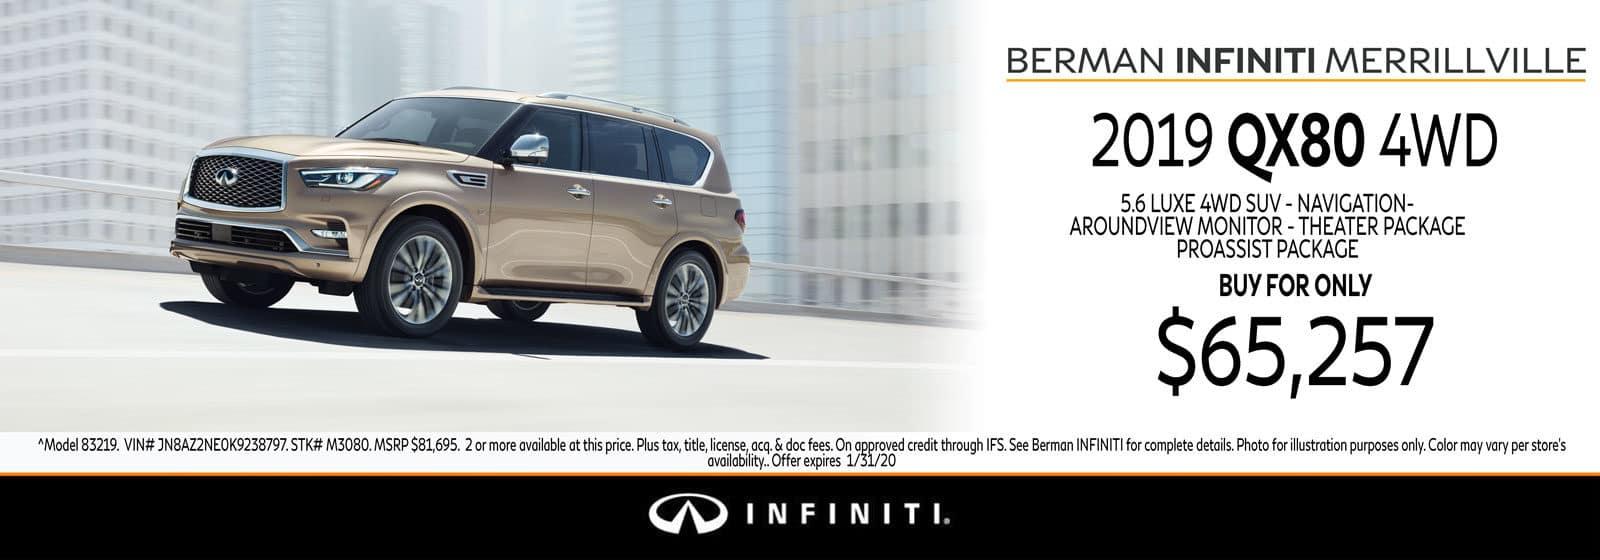 New 2019 INFINITI QX80 January Offer at Berman INFINITI of Merrillville!